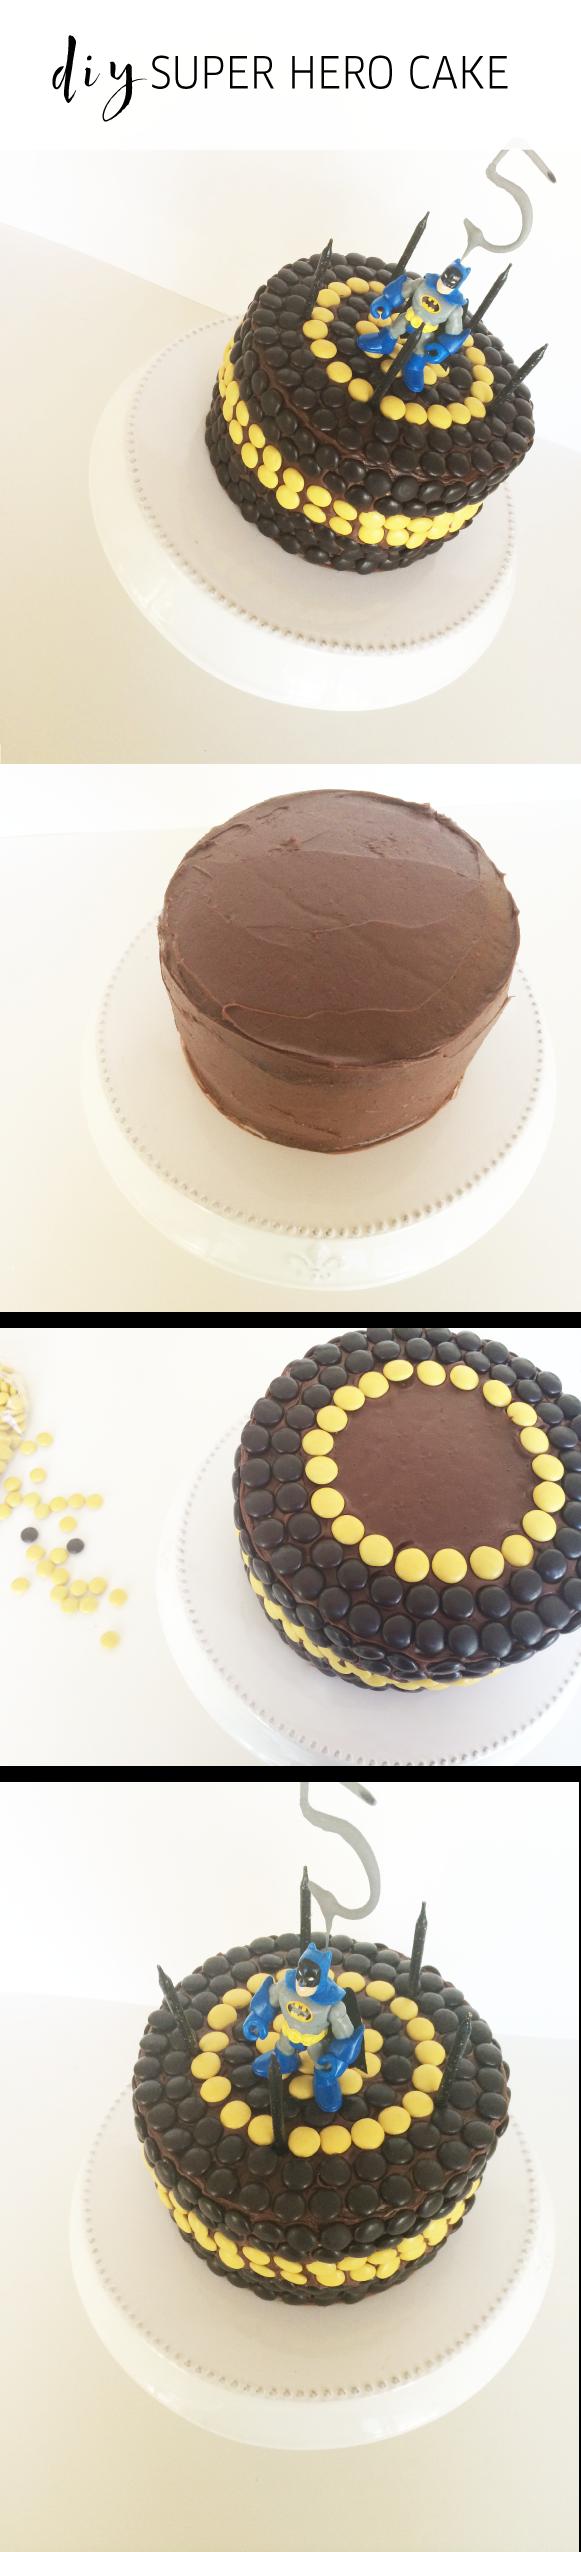 TOMFO-DIY-SUPER-HERO-PARTY-CAKE